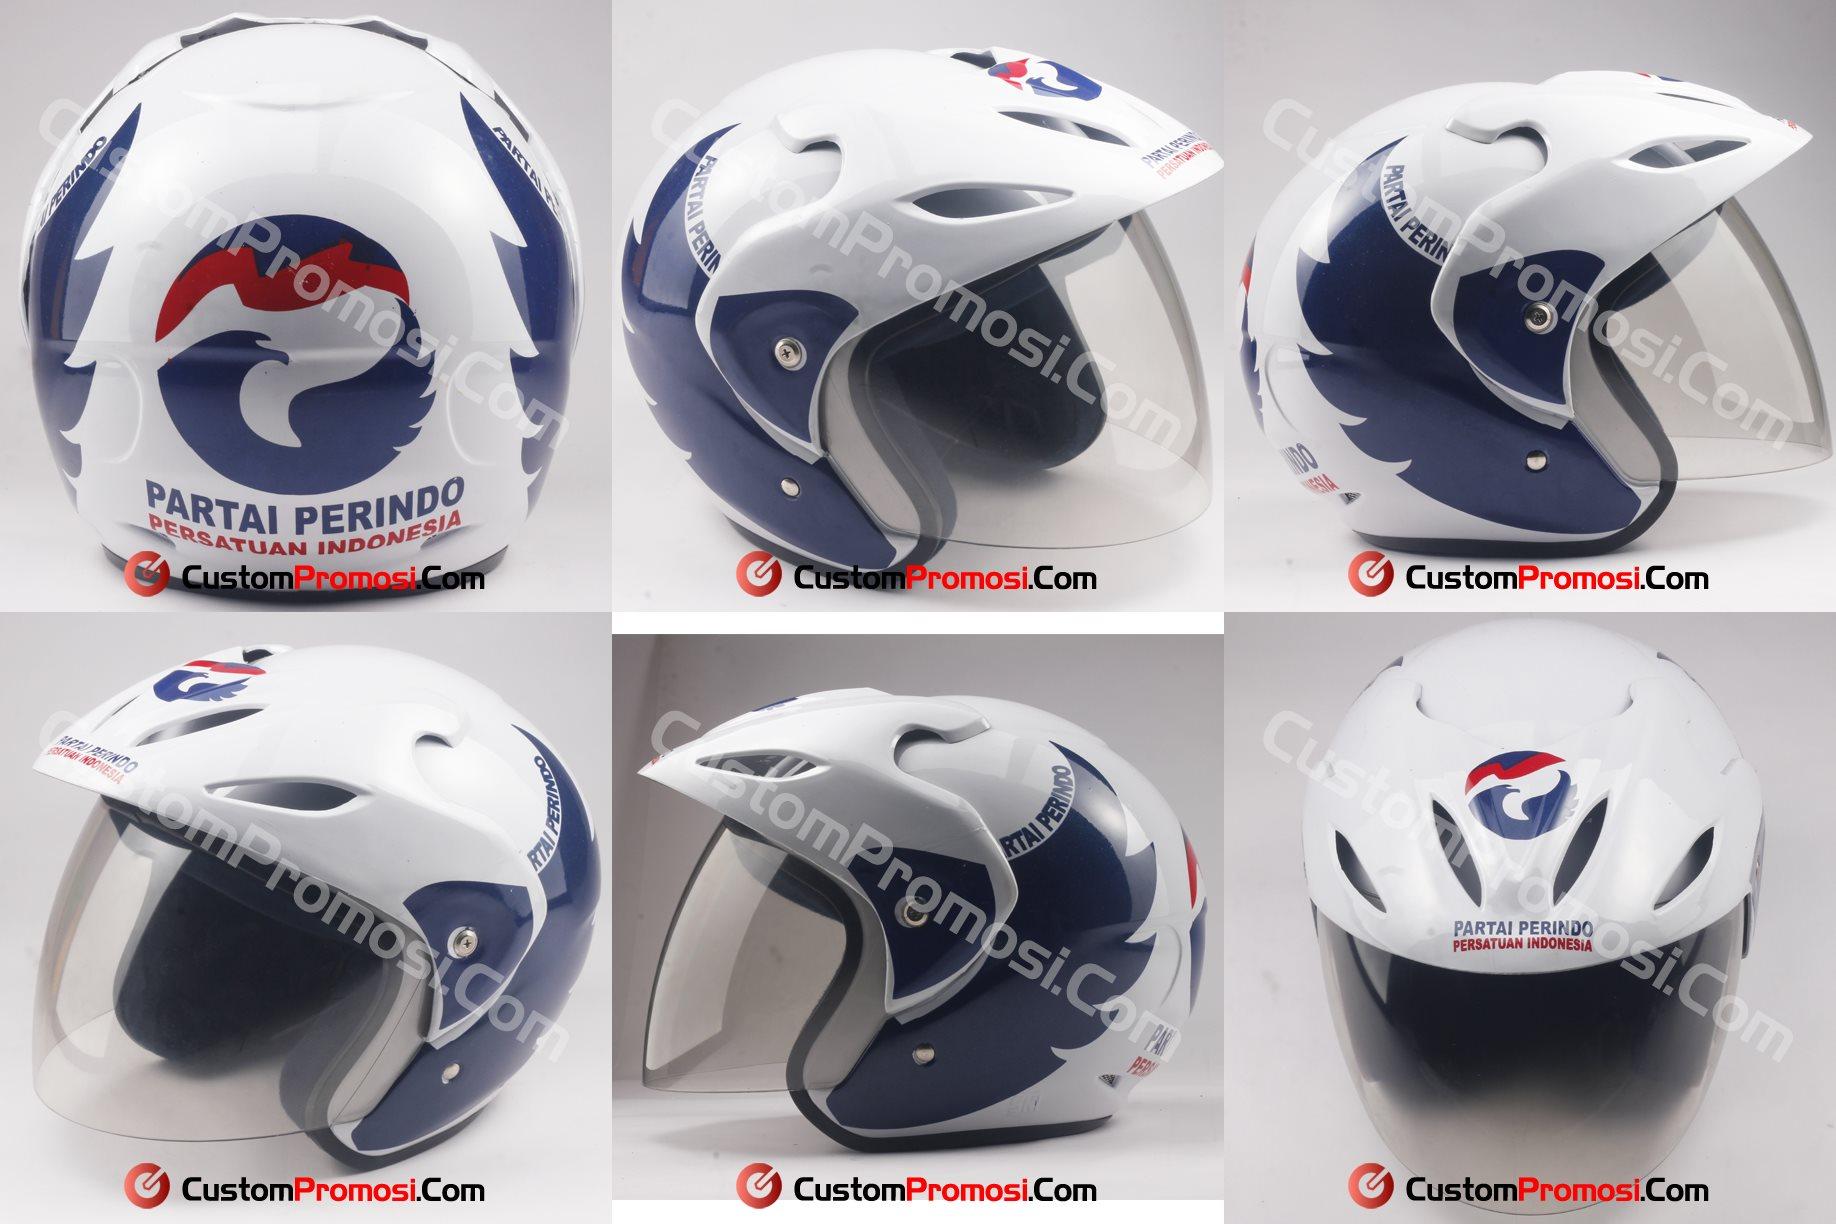 Helm Untuk kampanye partai perindo